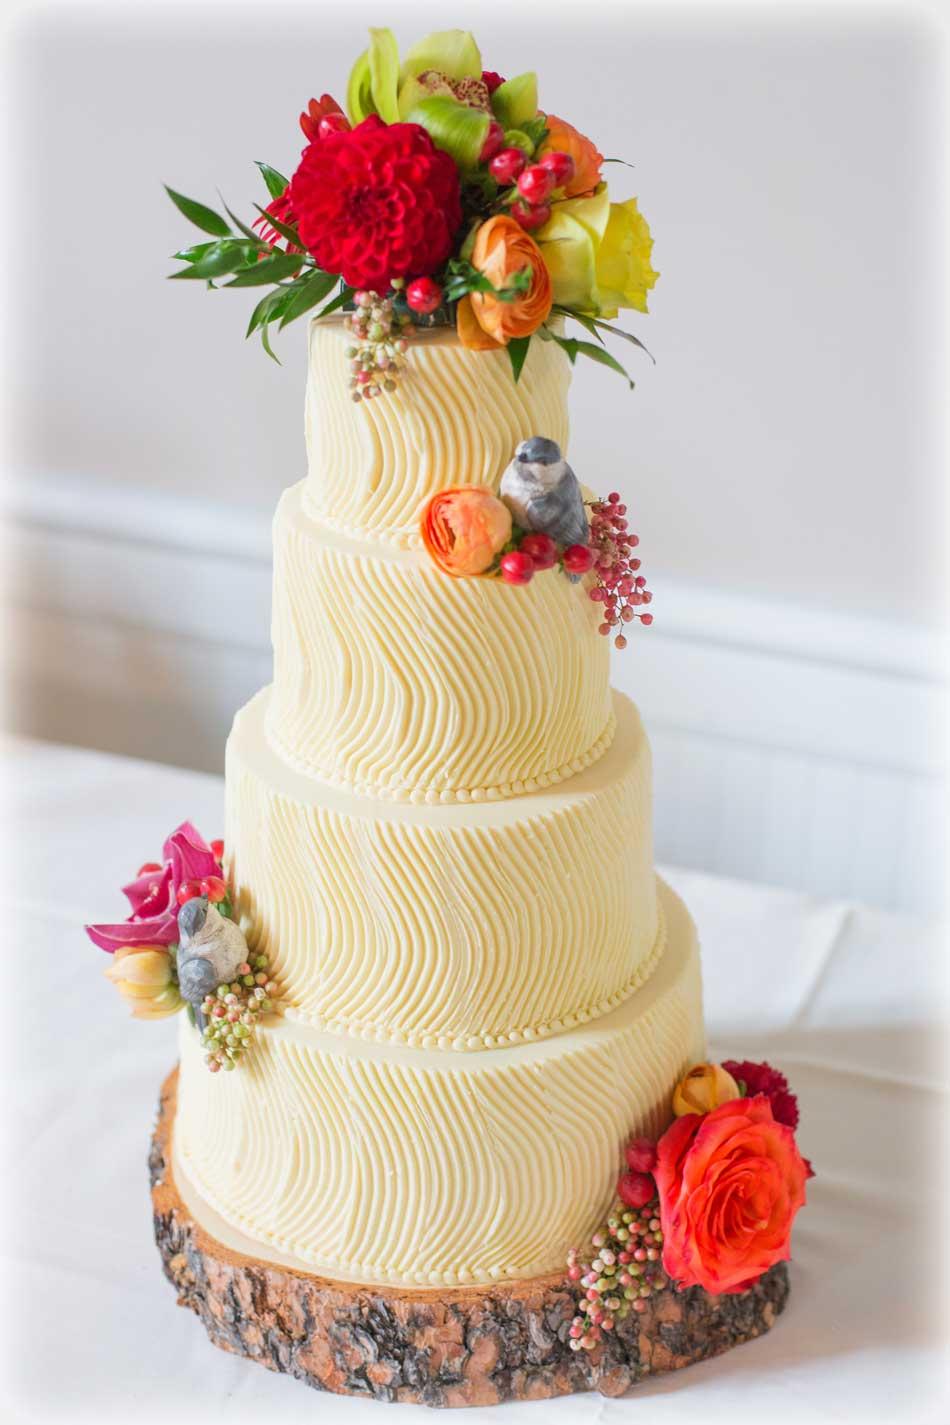 Wedding Cake with Fresh Flowers